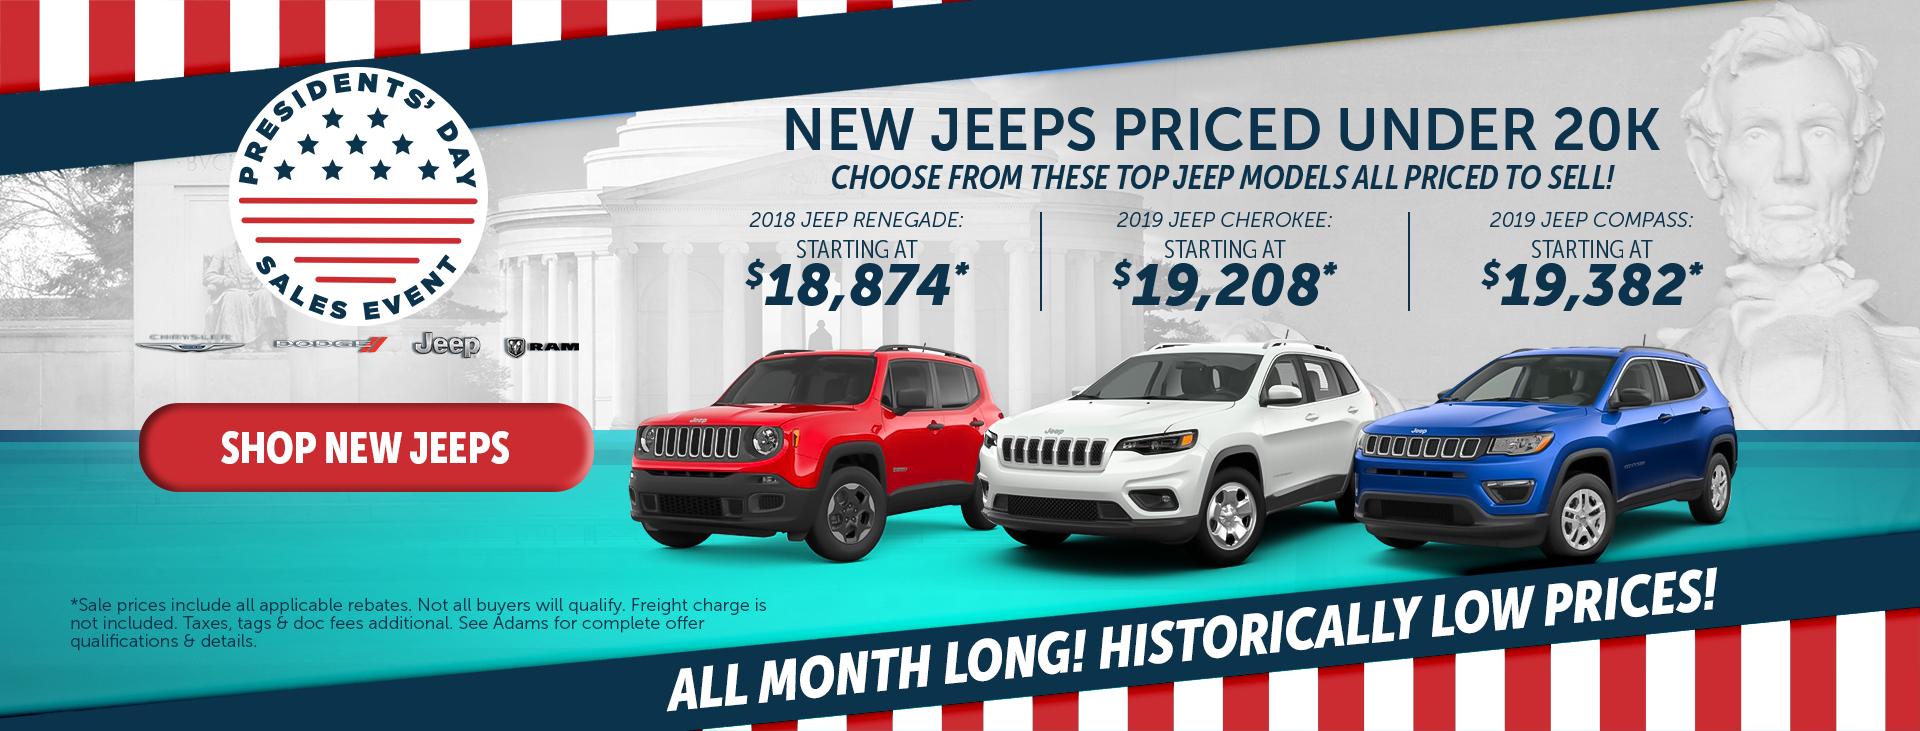 adams chrysler dodge jeep ram jeeps under $20k